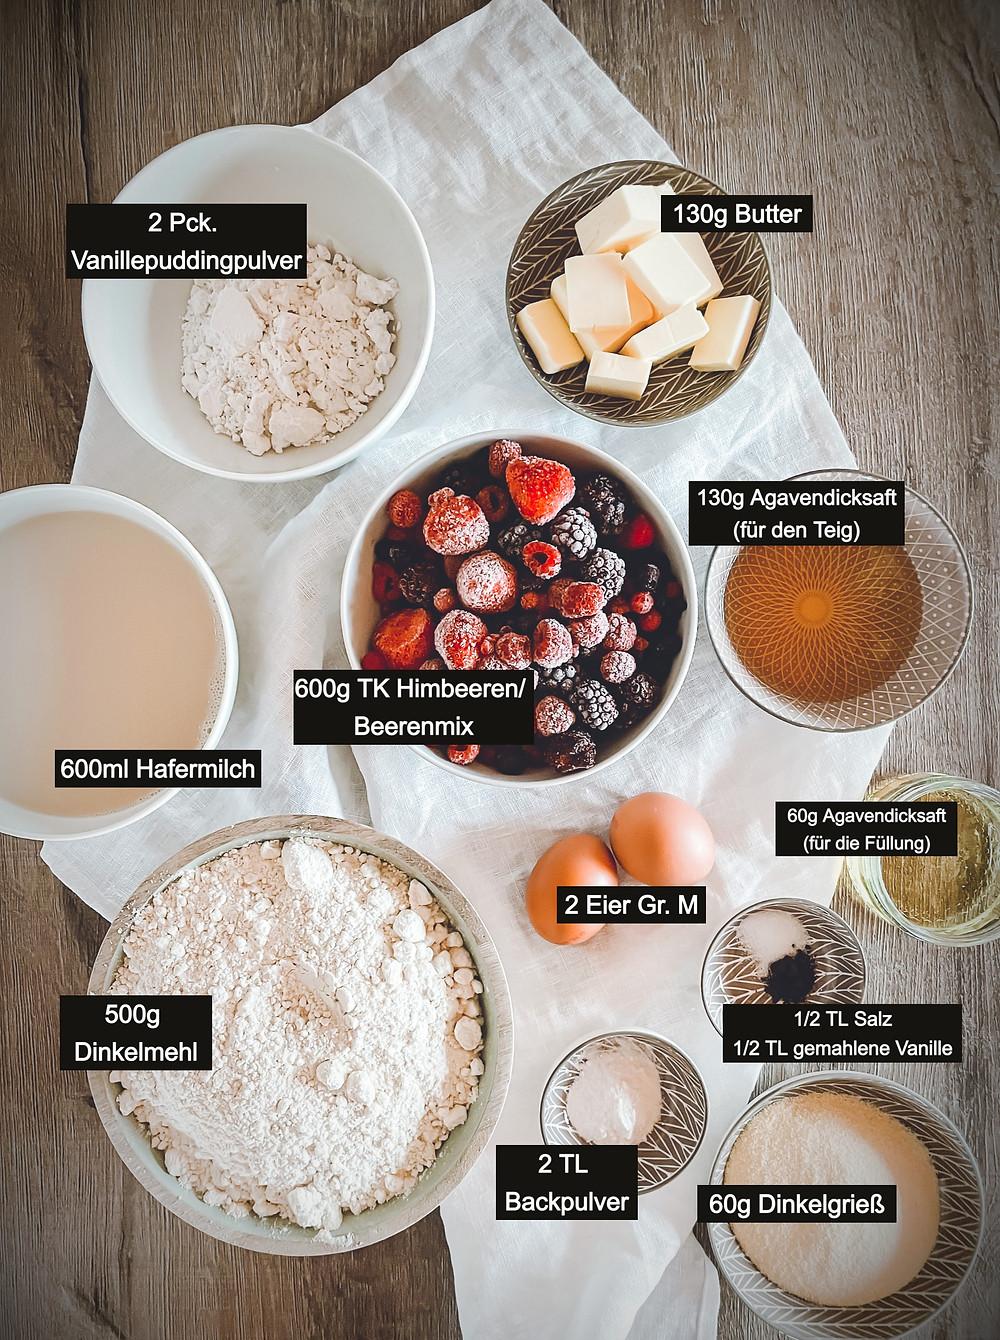 focusflowfood focus flow food beeren pudding kuchen streusel dinkelmehl rezept gesund lecker einfach